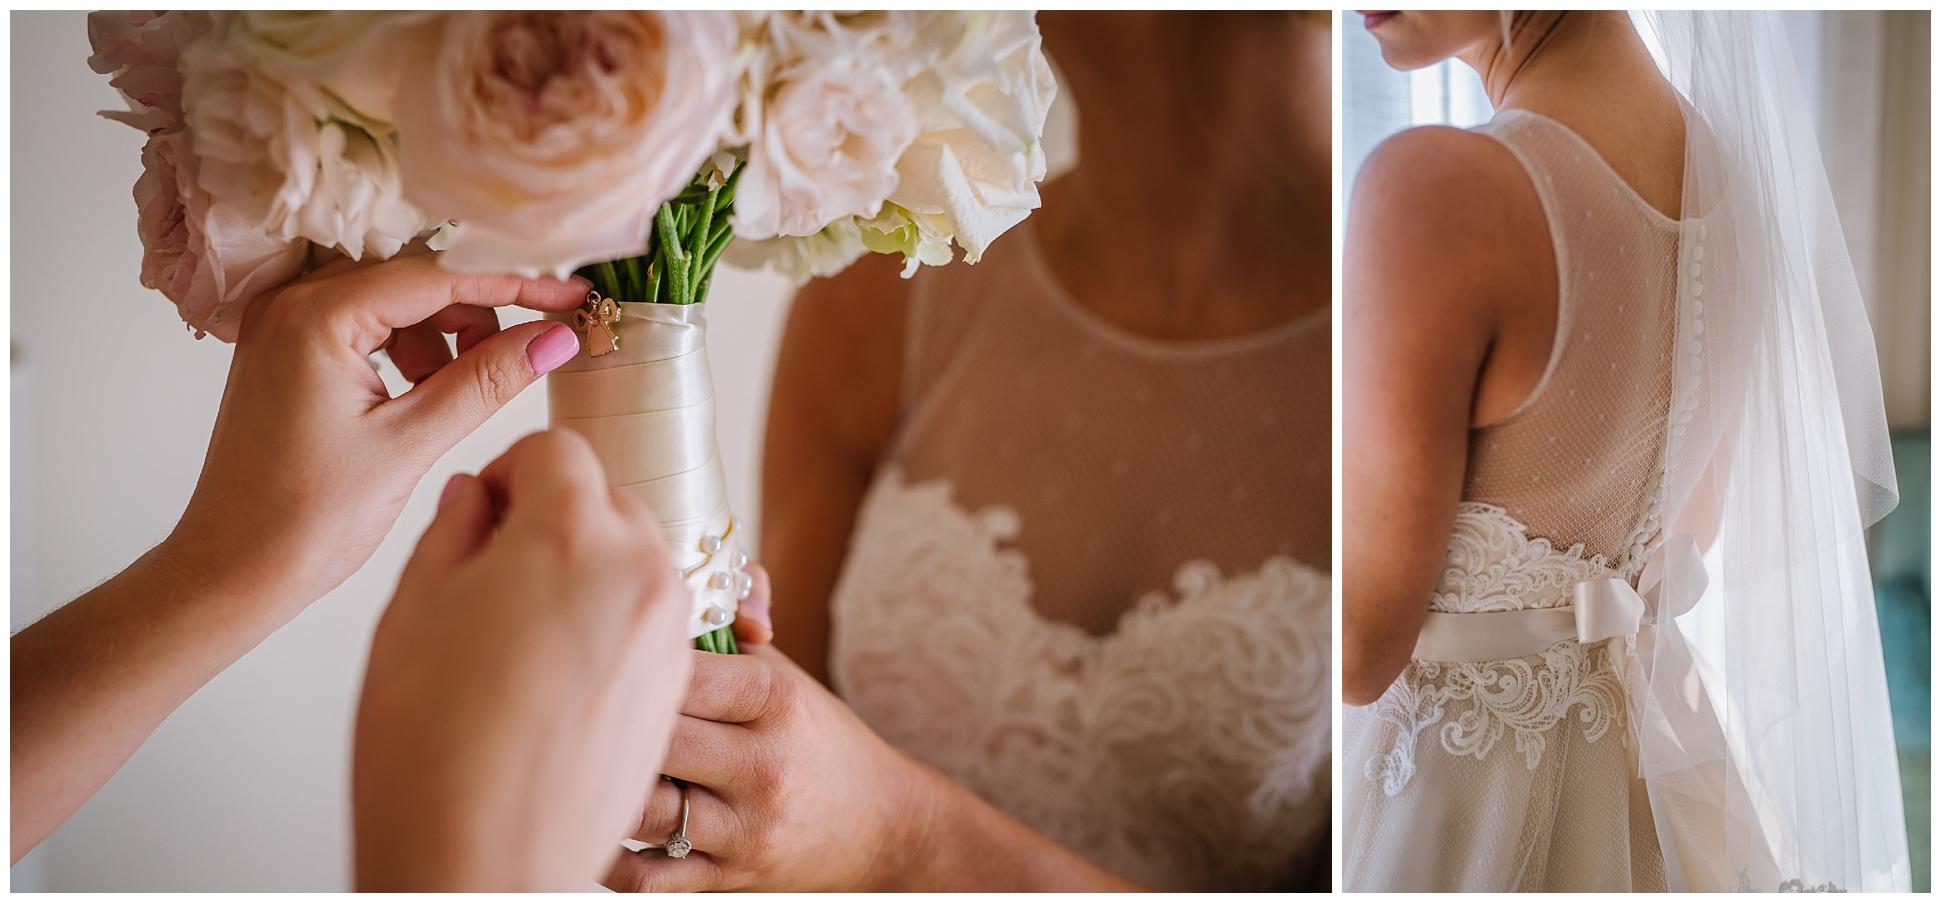 Sarasota-wedding-photographer-hyatt-regency-blush_0020.jpg